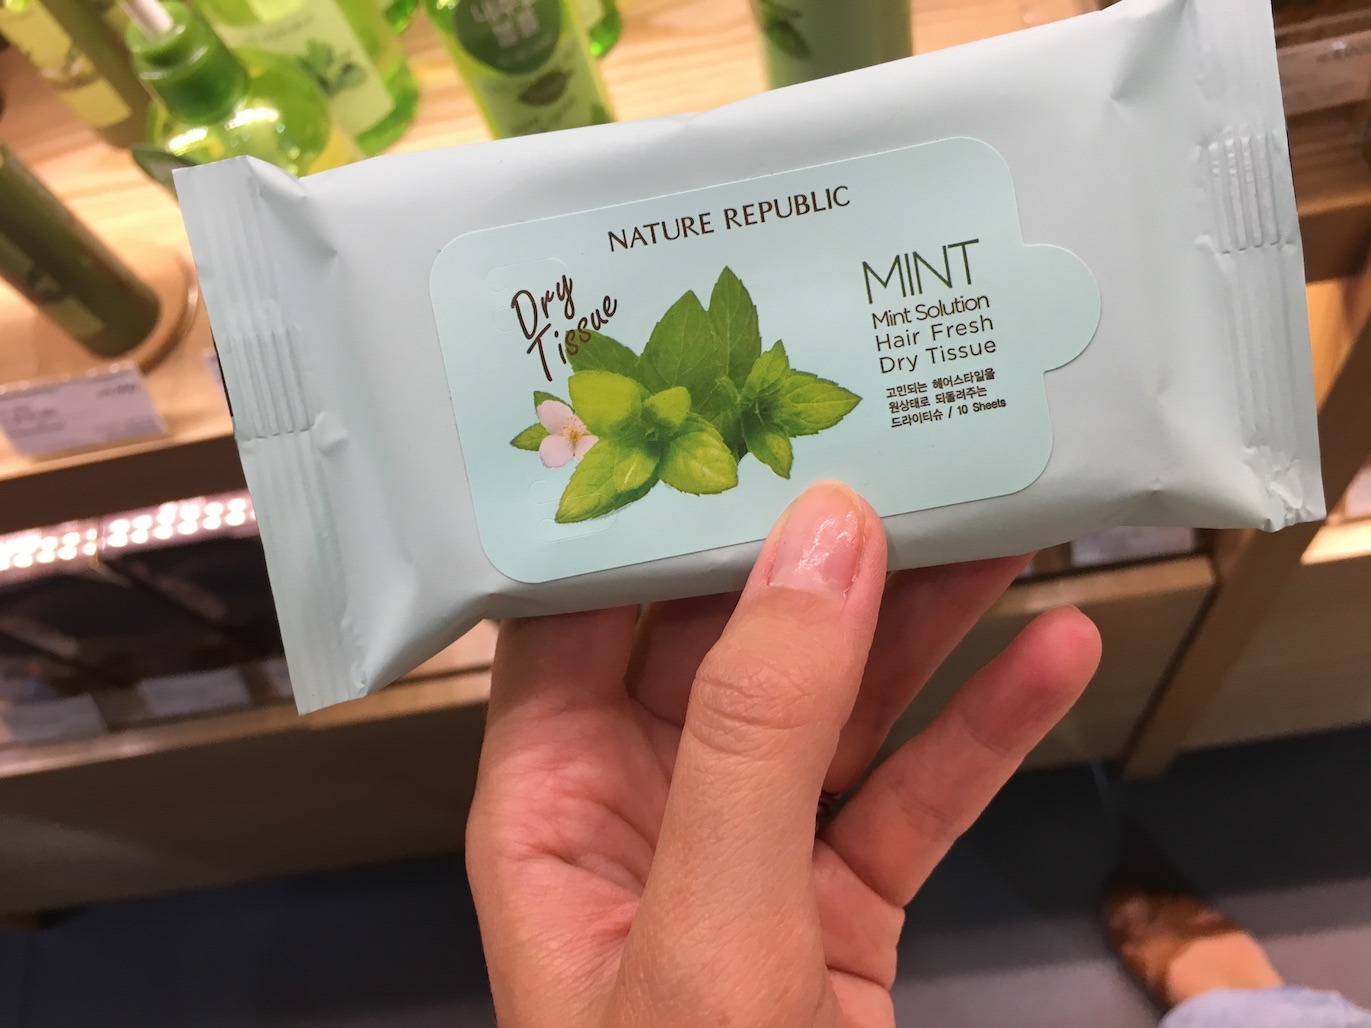 Nature Republic Mint Solution Hair Fresh Dry Tissue